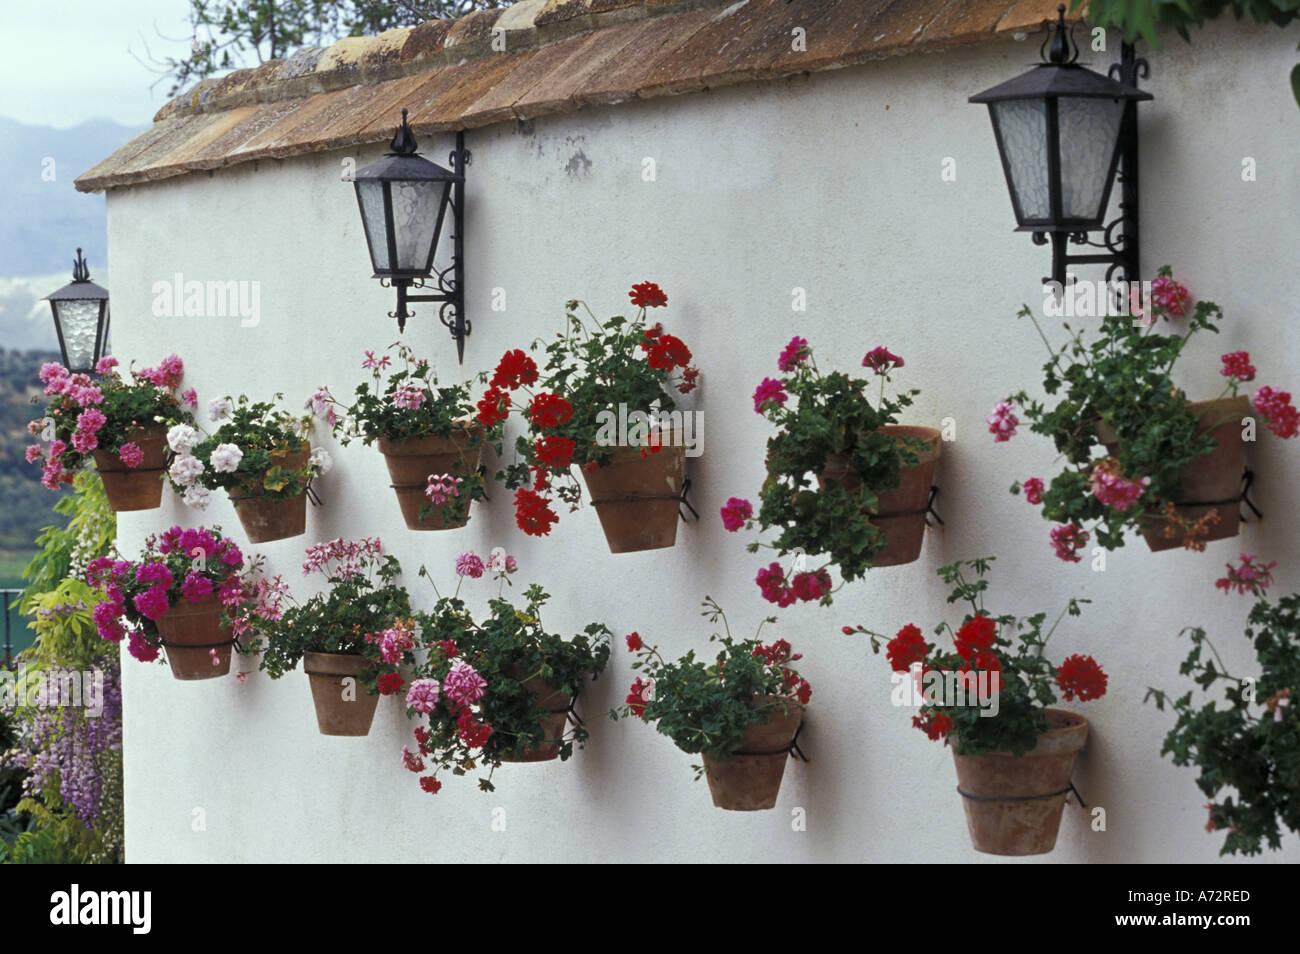 Alamy & Spain Andalucia Ronda Flower pots of geraniums line white ...